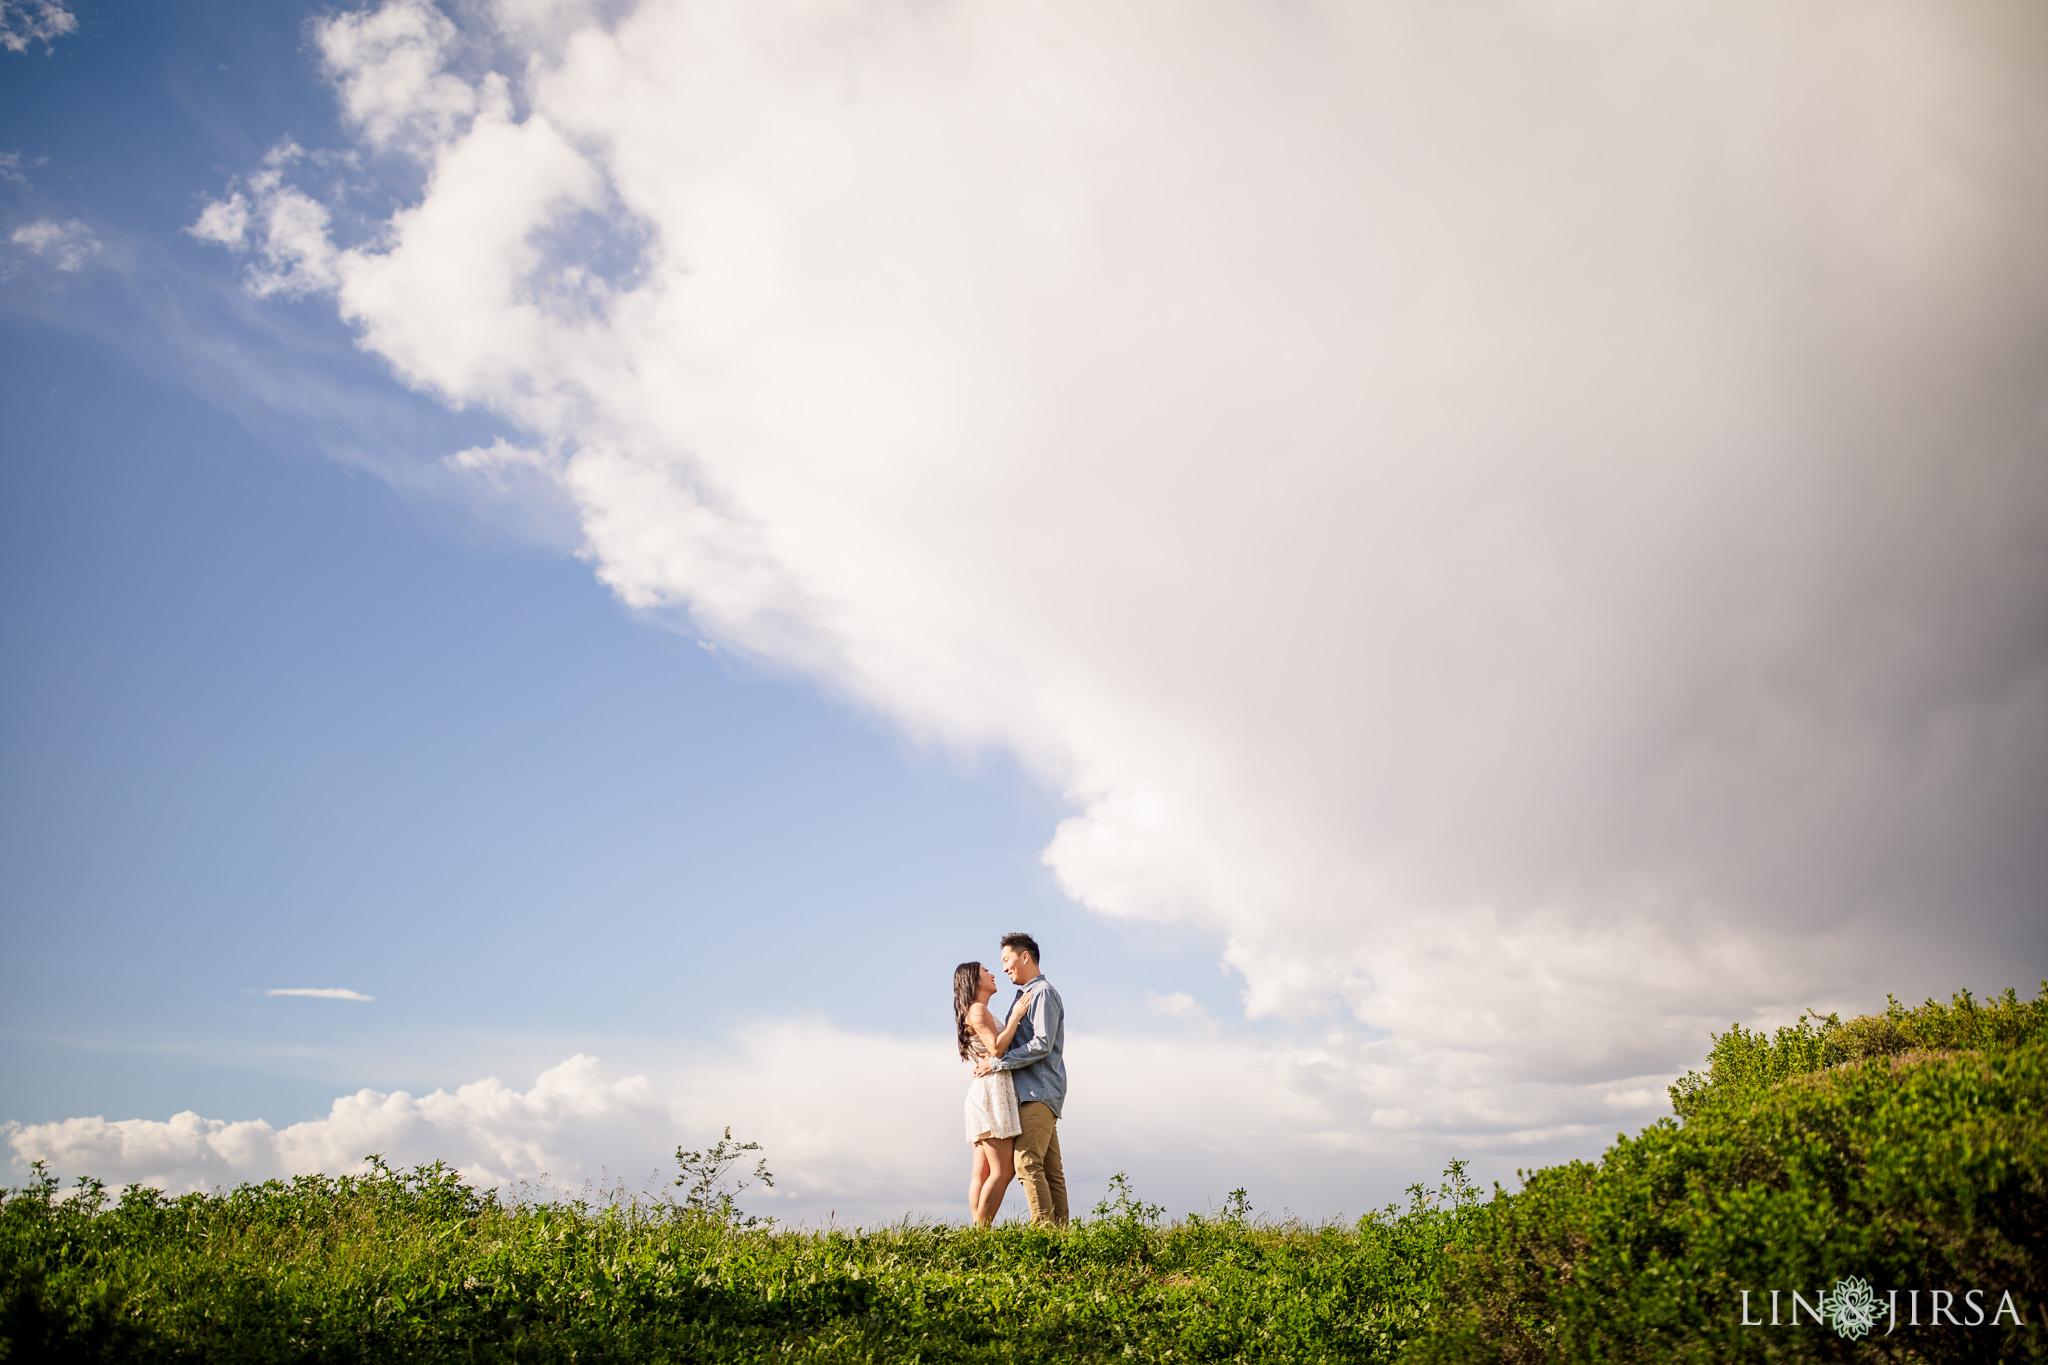 zbf Quail Hill Orange County Engagement Photography